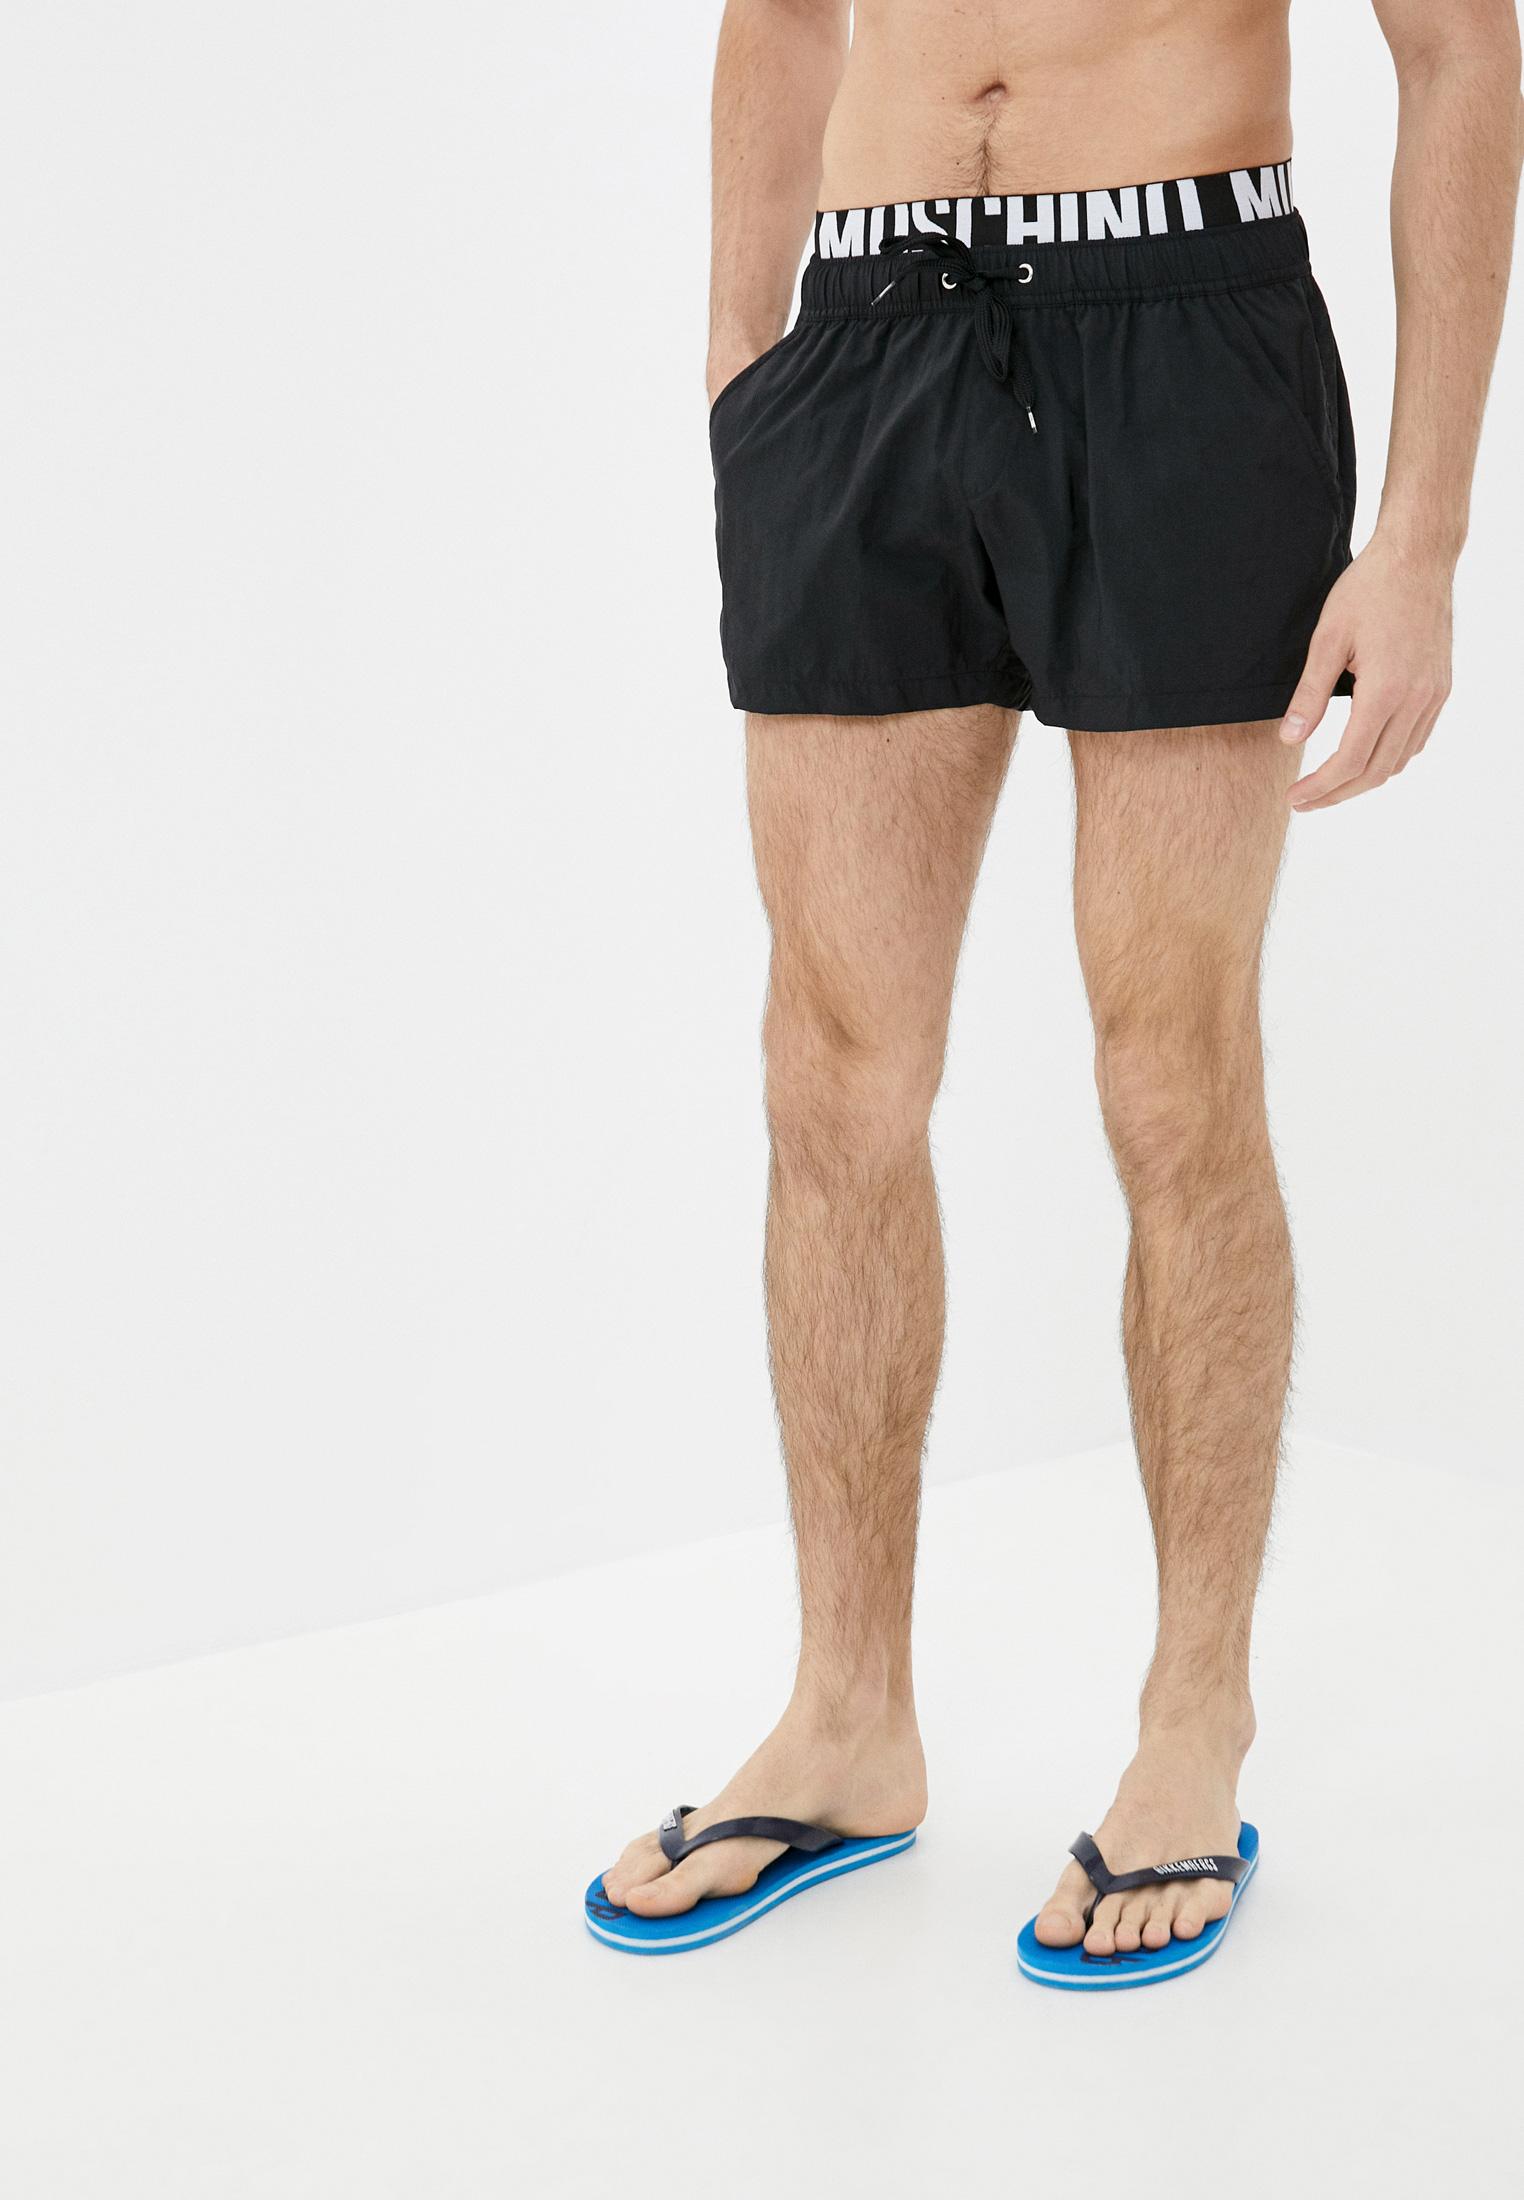 Мужские шорты для плавания Moschino swim 6148 5439